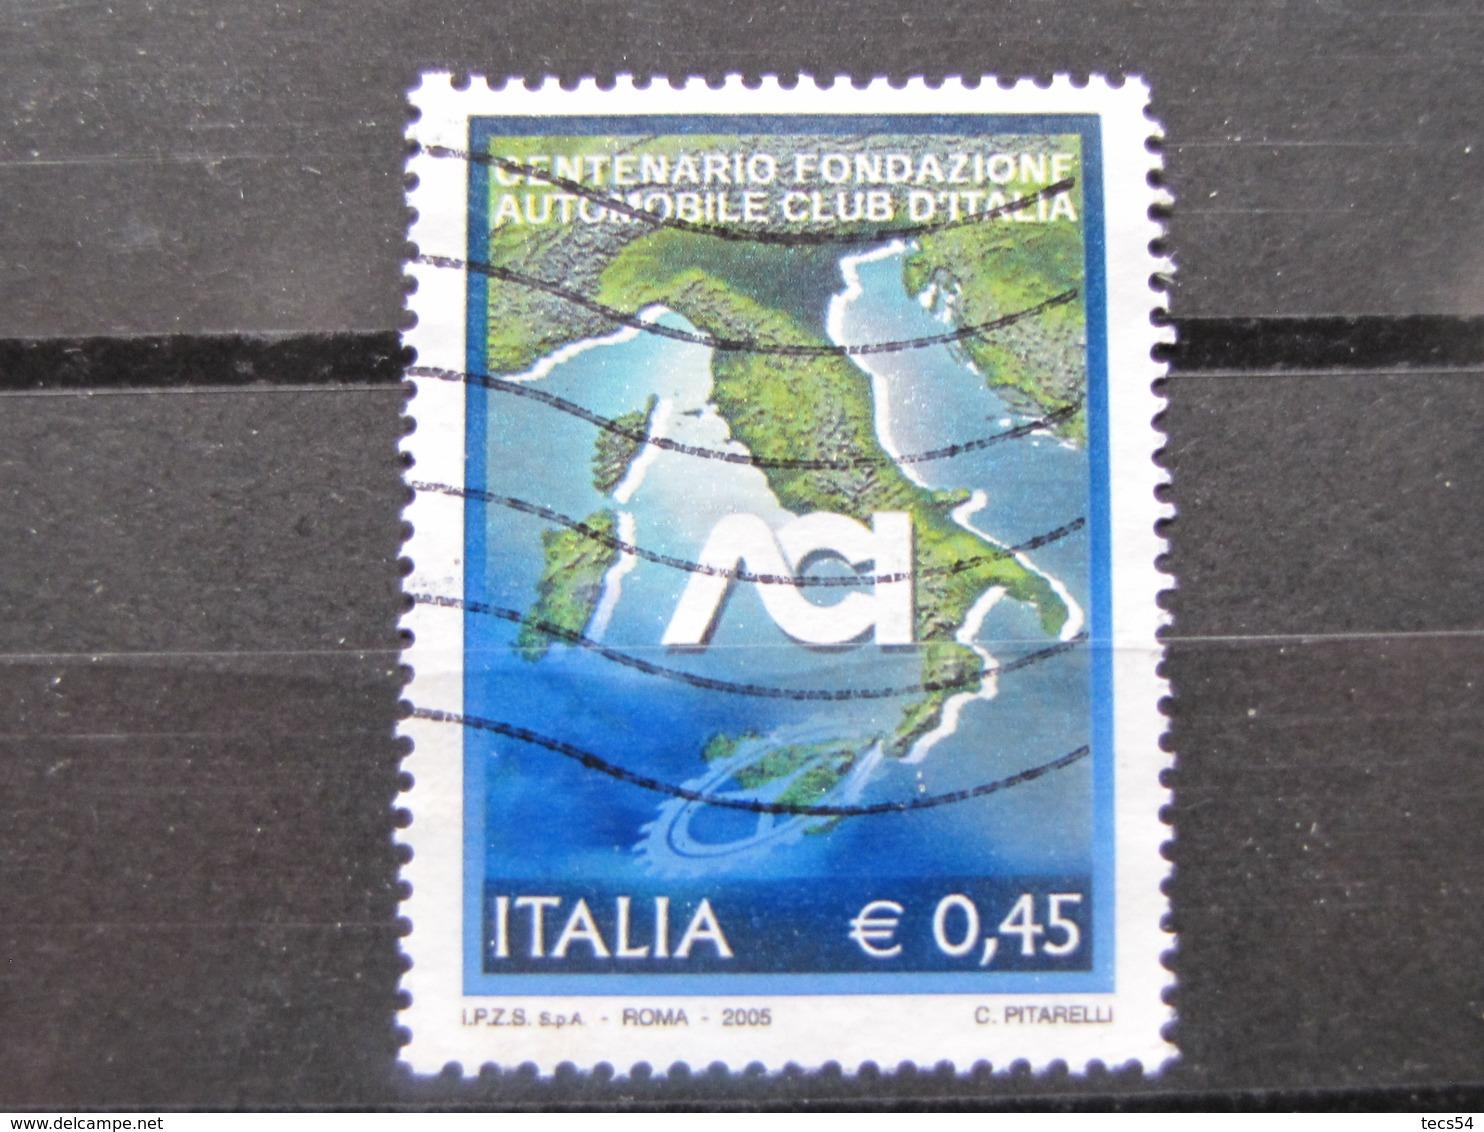 *ITALIA* USATI 2005 - CENTENARIO ACI - SASSONE 2799 - LUSSO/FIOR DI STAMPA - 6. 1946-.. Repubblica